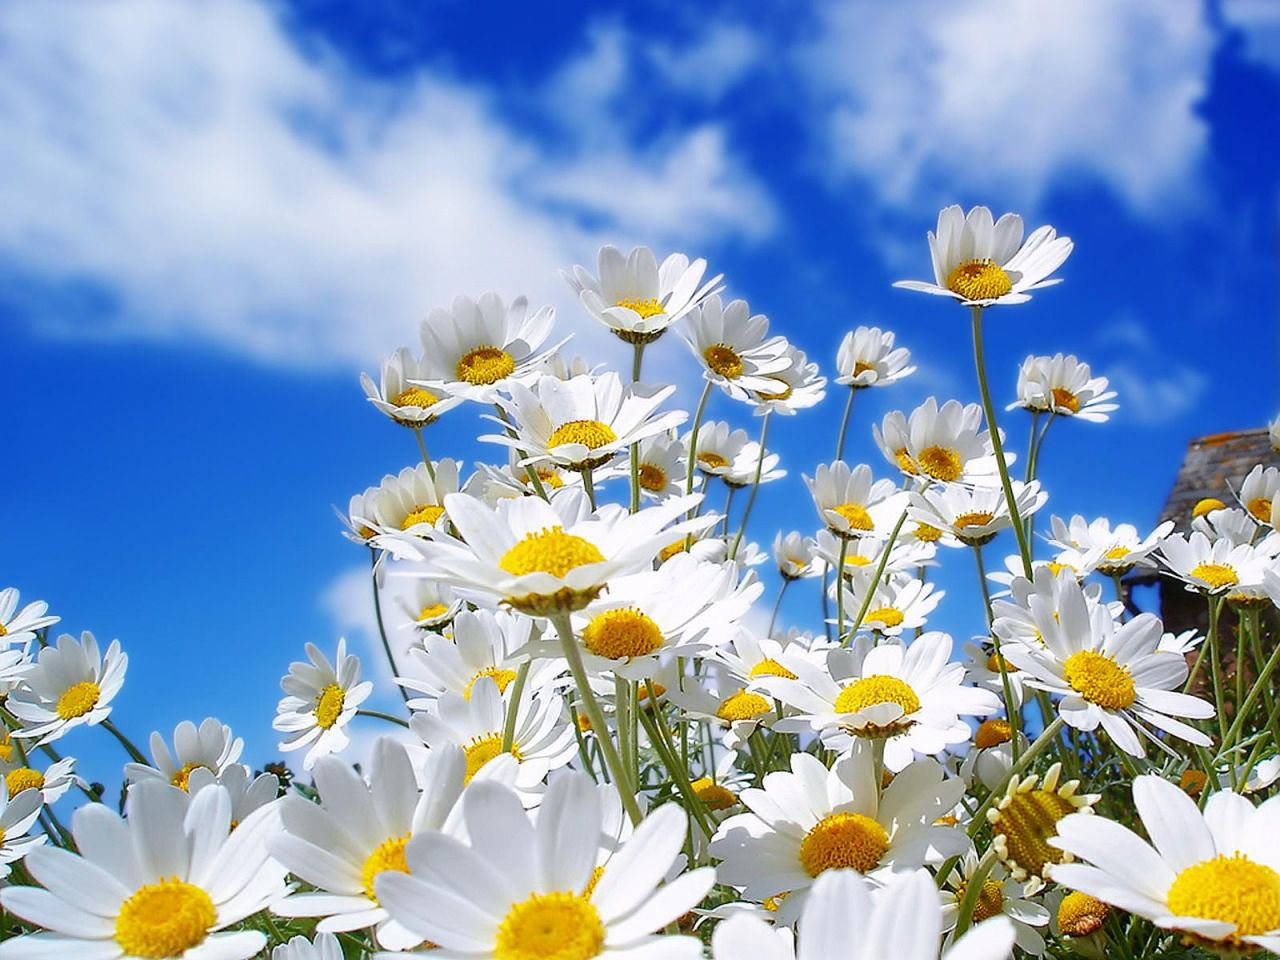 23 Beautiful Free Spring Wallpapers To Bring You Joy